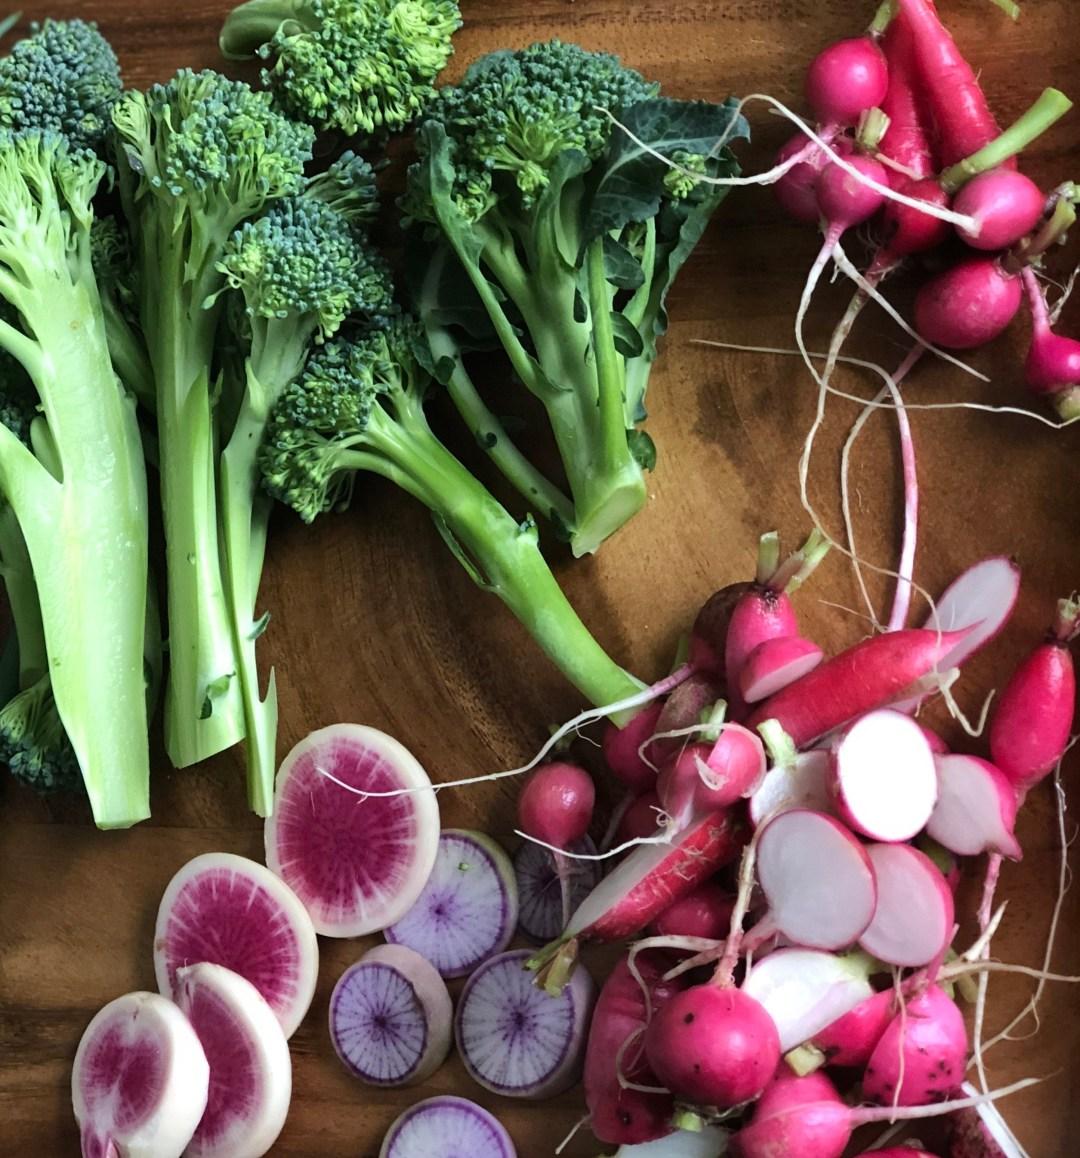 D-broccoli-radish-IMG_7491-146681934-1552681999123.jpeg